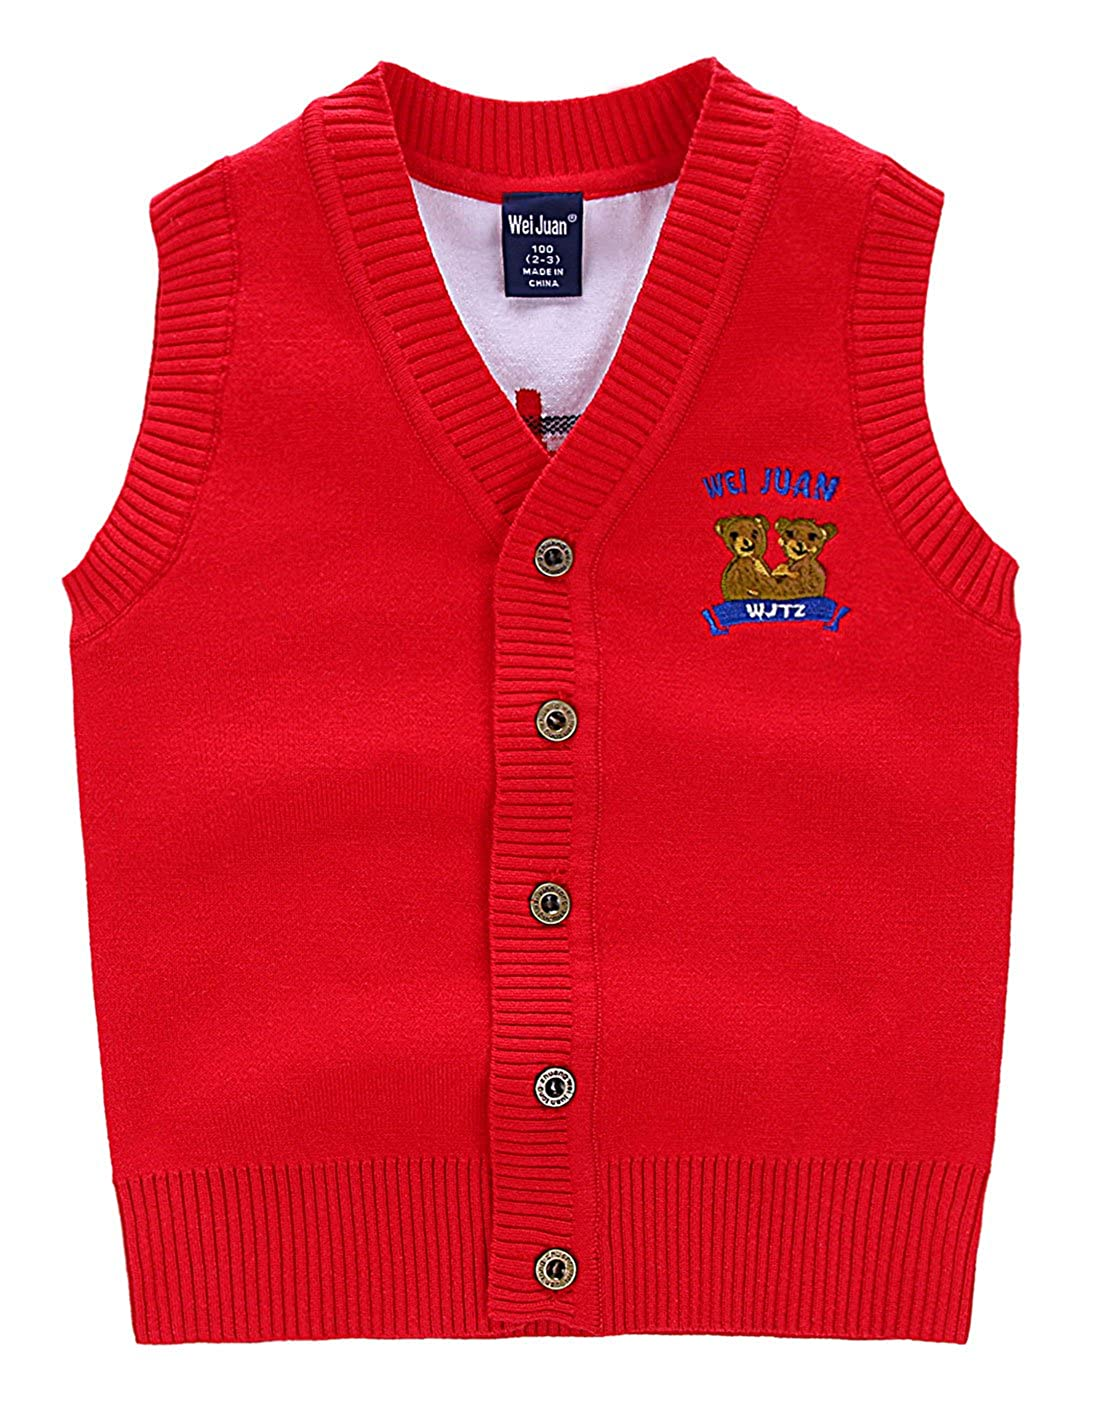 Wei Juan Boys Cardigan Sweater Vest Cartton Bears Unisex Kids Button Down Waistcoat 2-7T